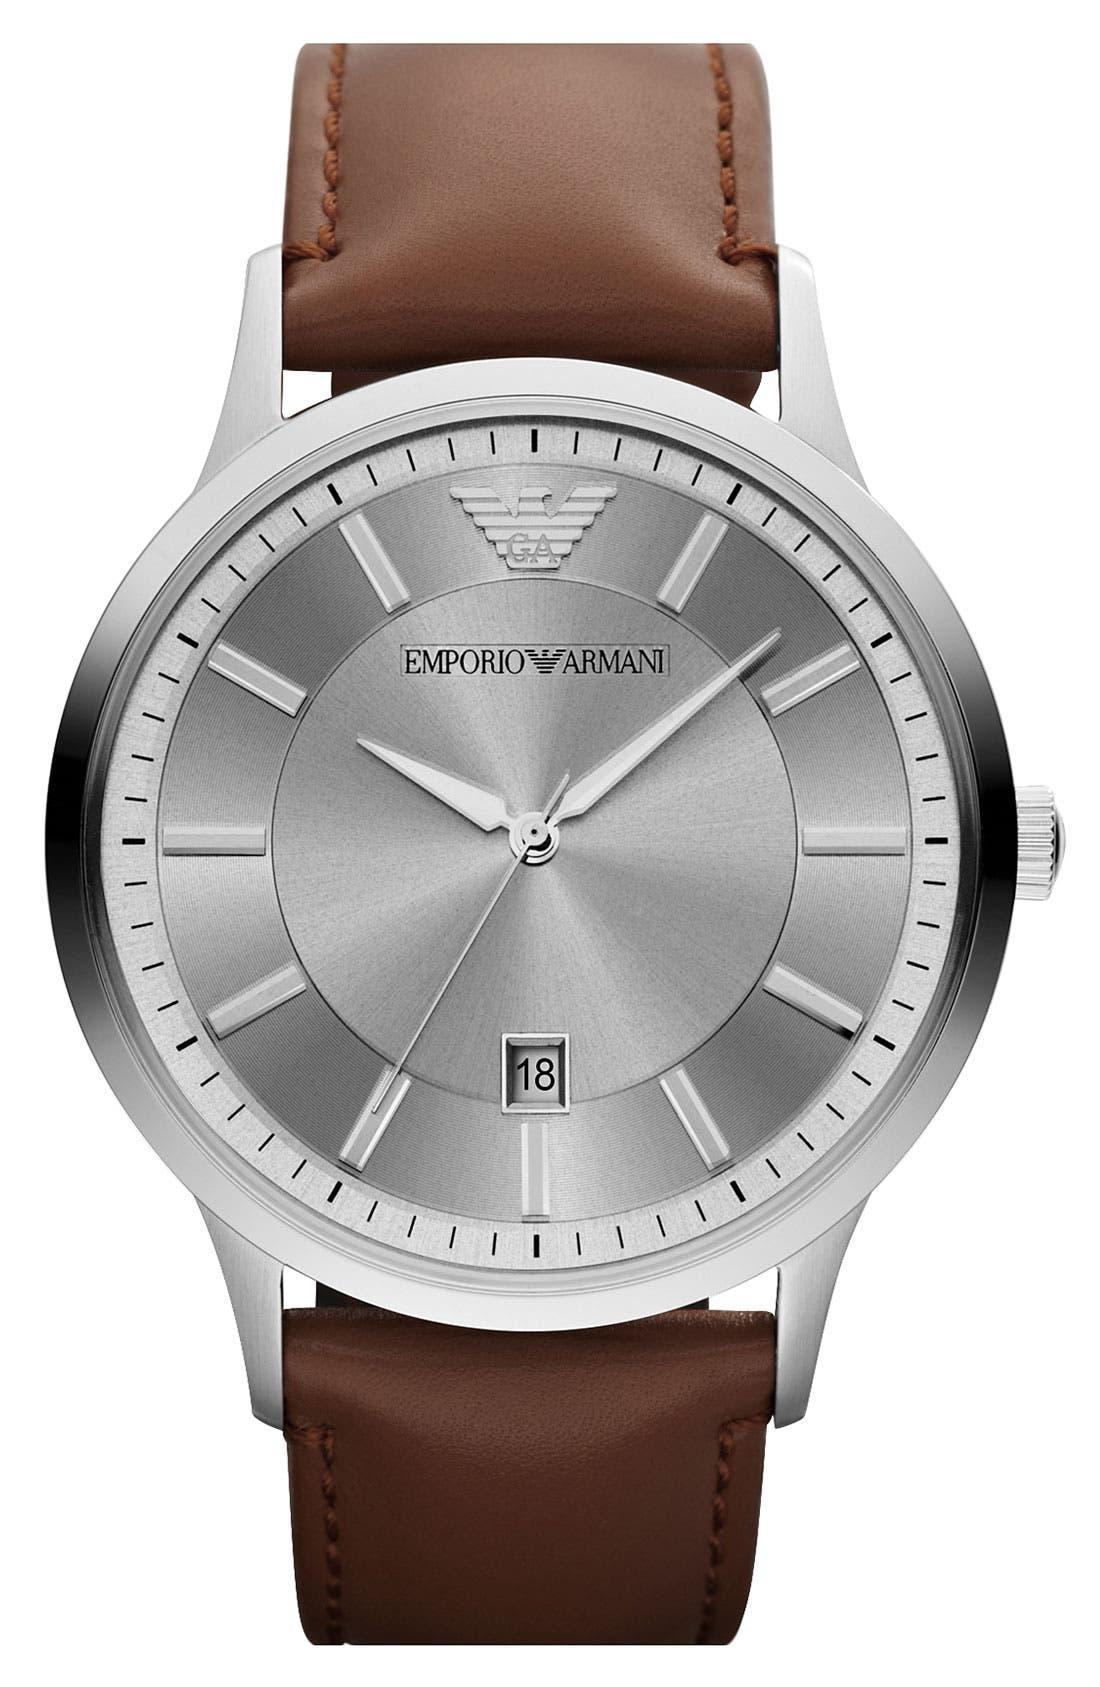 EMPORIO ARMANI Round Leather Strap Watch, 43mm, Main, color, 200